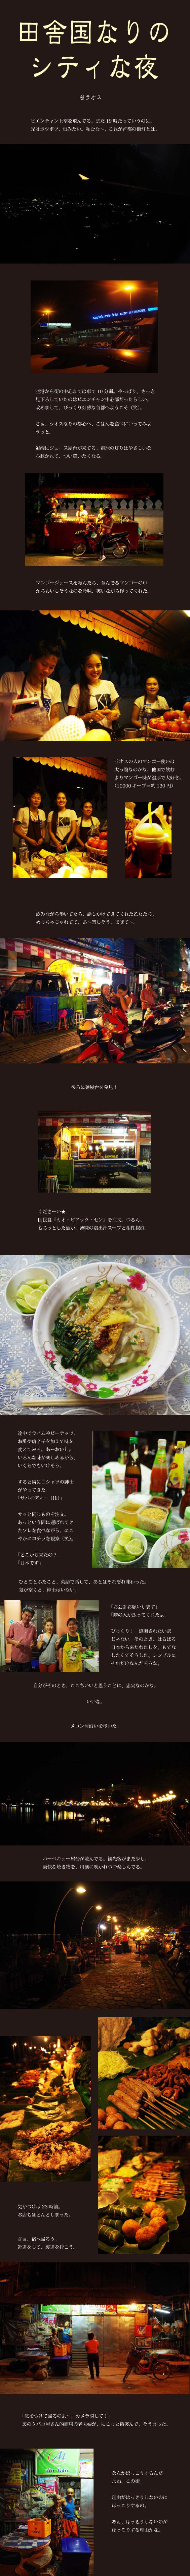 tomako161006.jpg